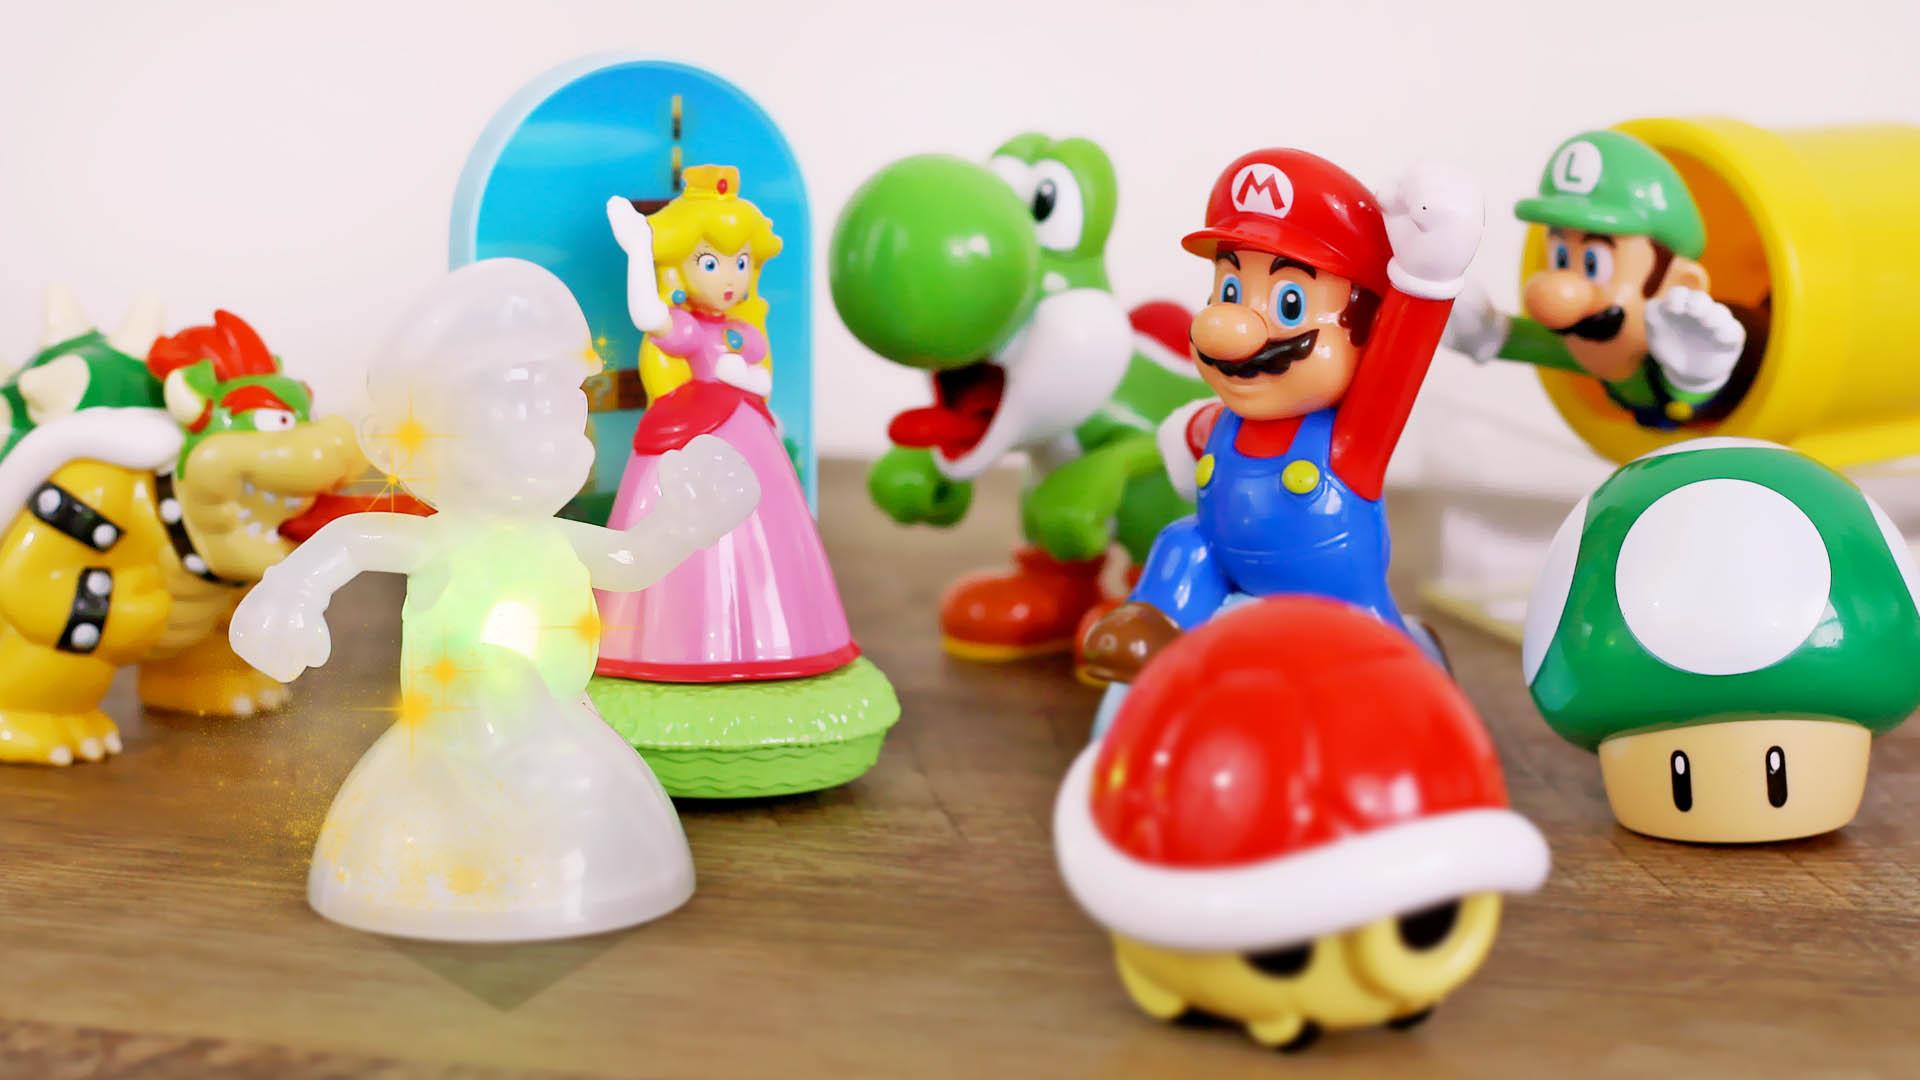 McDonalds Super Mario Happy Meal Toys Unboxing 2017